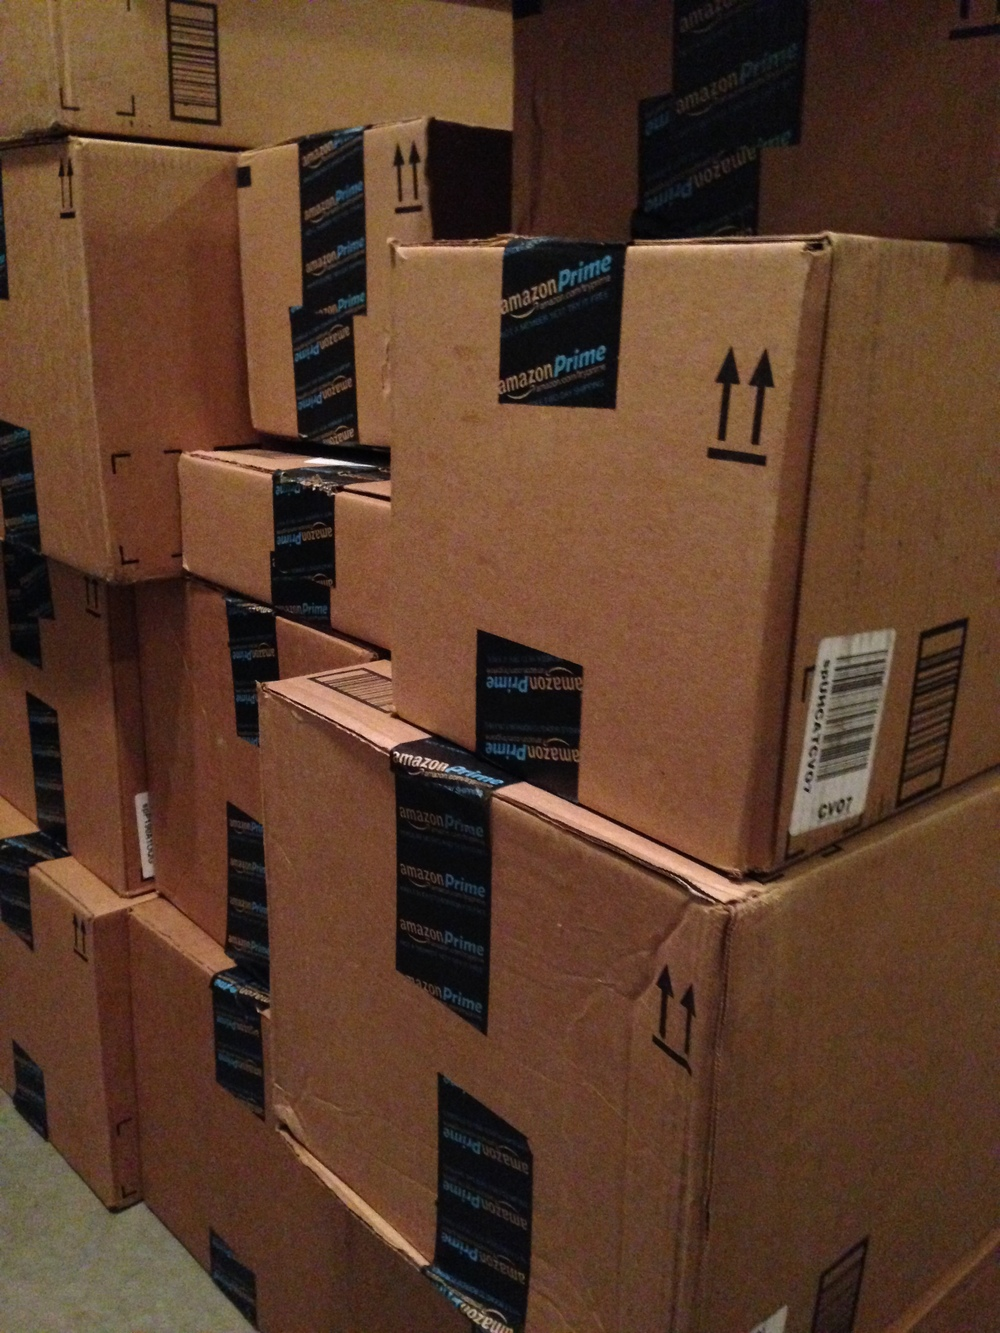 Amazonboxes.jpg